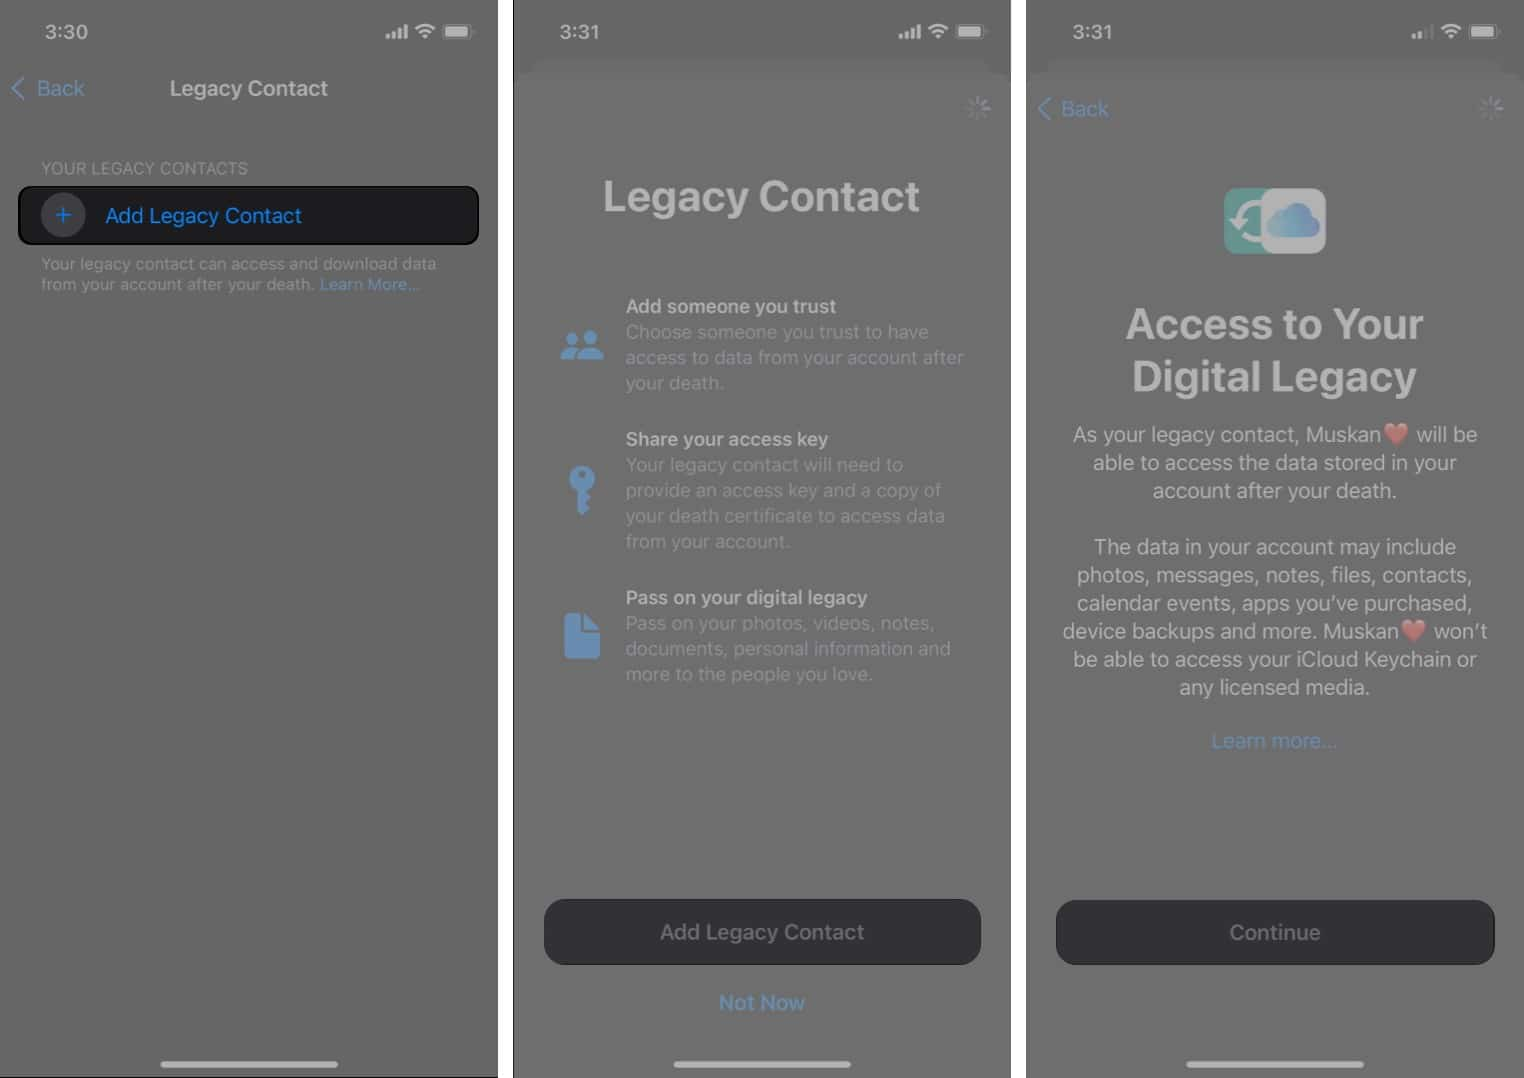 Add Digital Legacy contact on iPhone running iOS 15